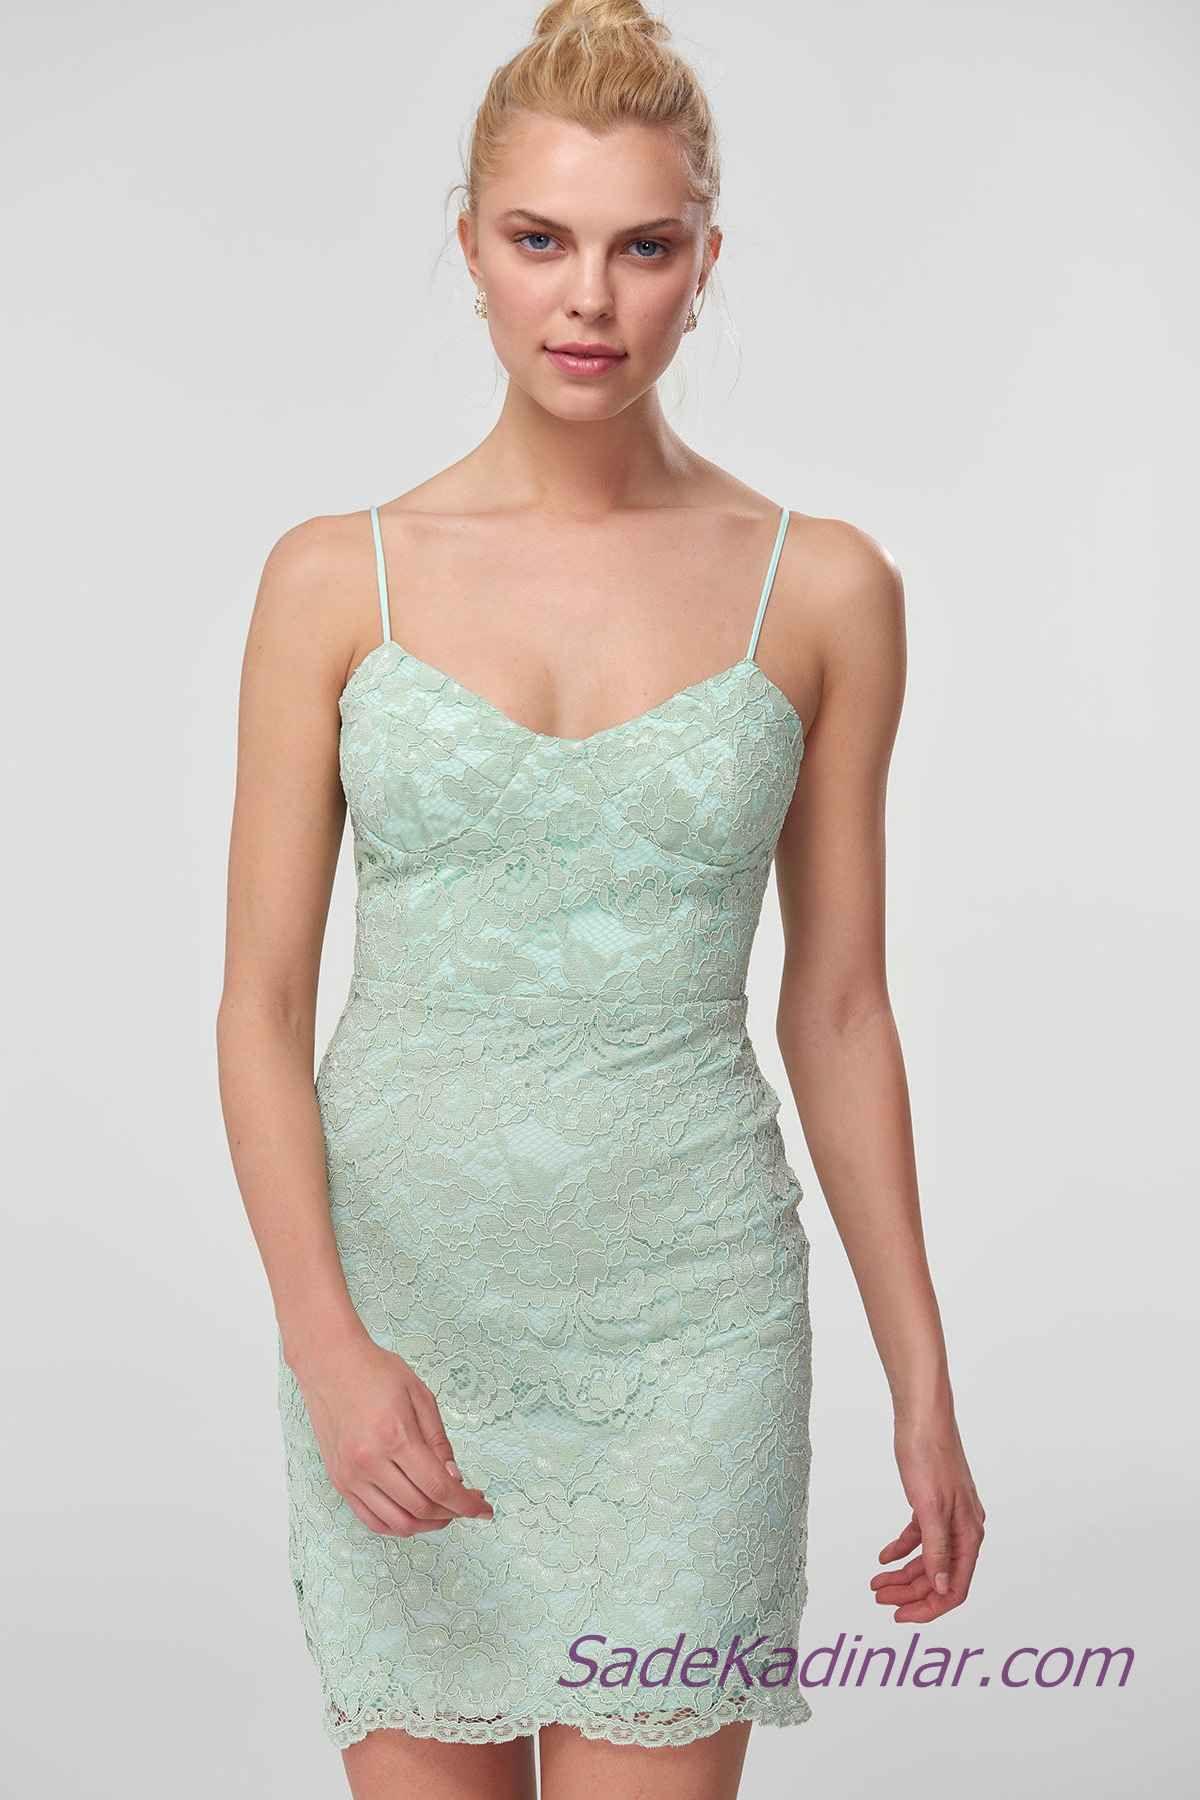 2021 Abiye Elbise Modelleri Yesil Kisa Ip Askili Dantel Detayli Elbise Modelleri The Dress Resmi Elbise